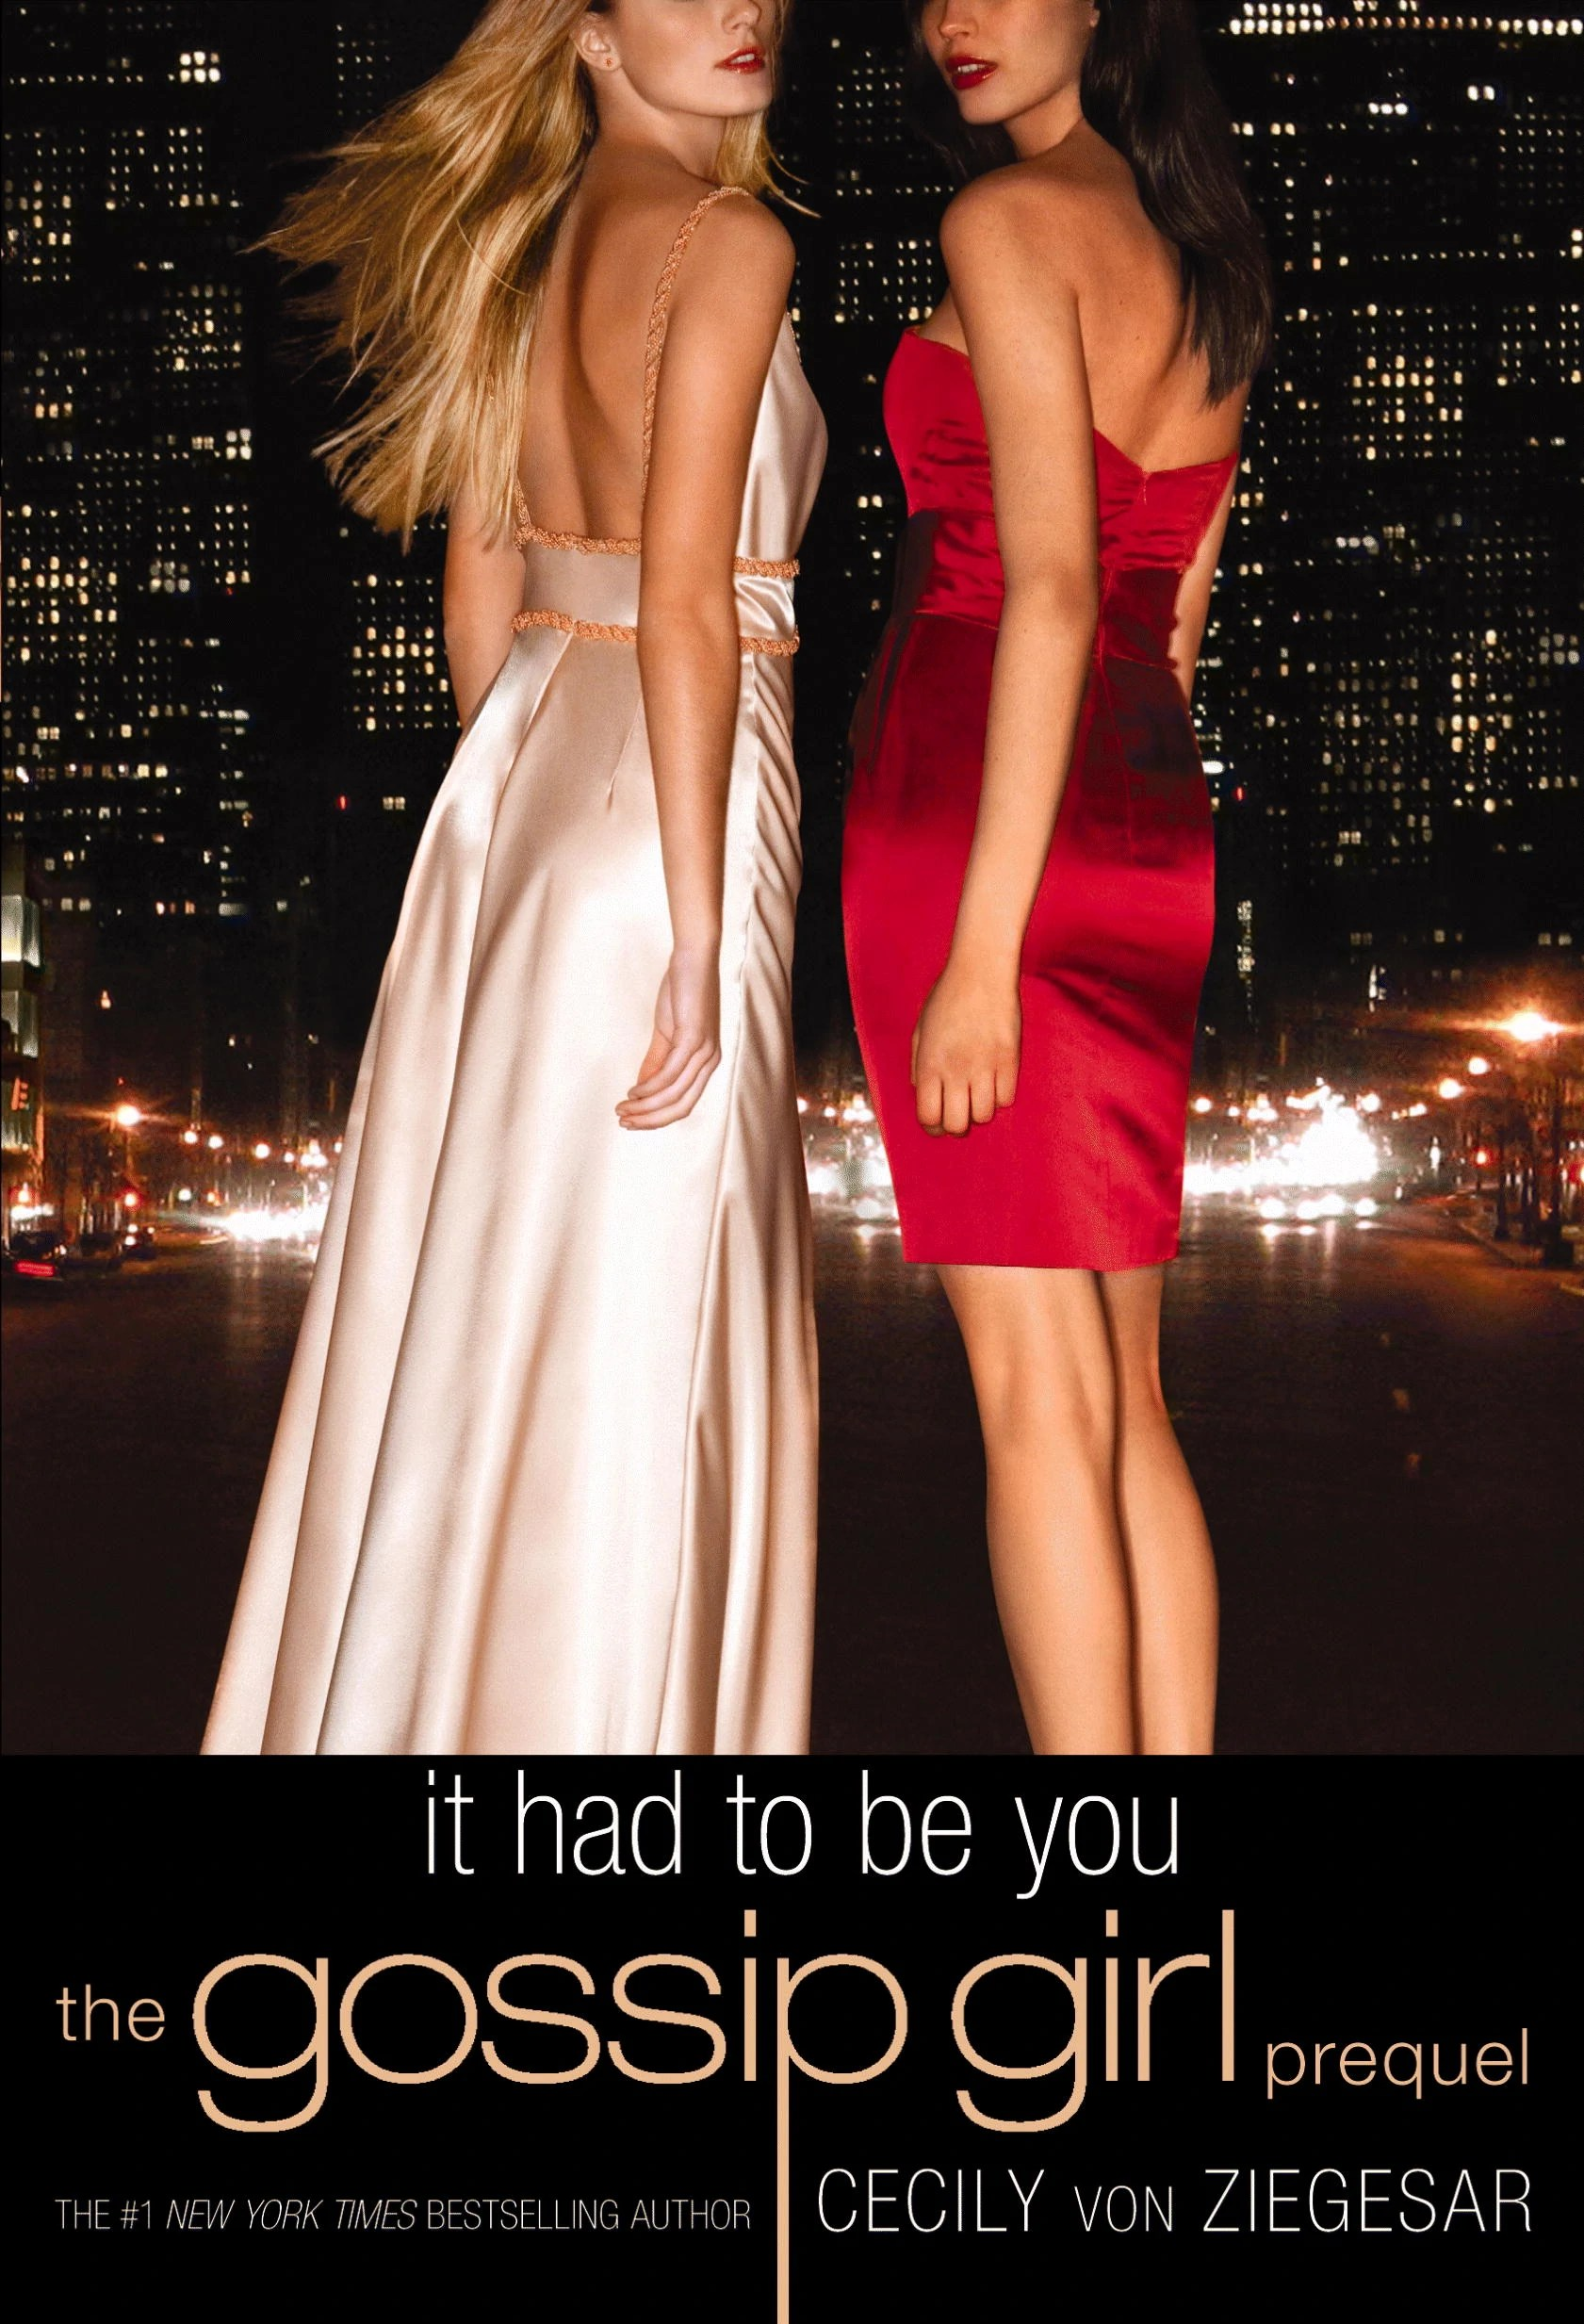 gossip girl books